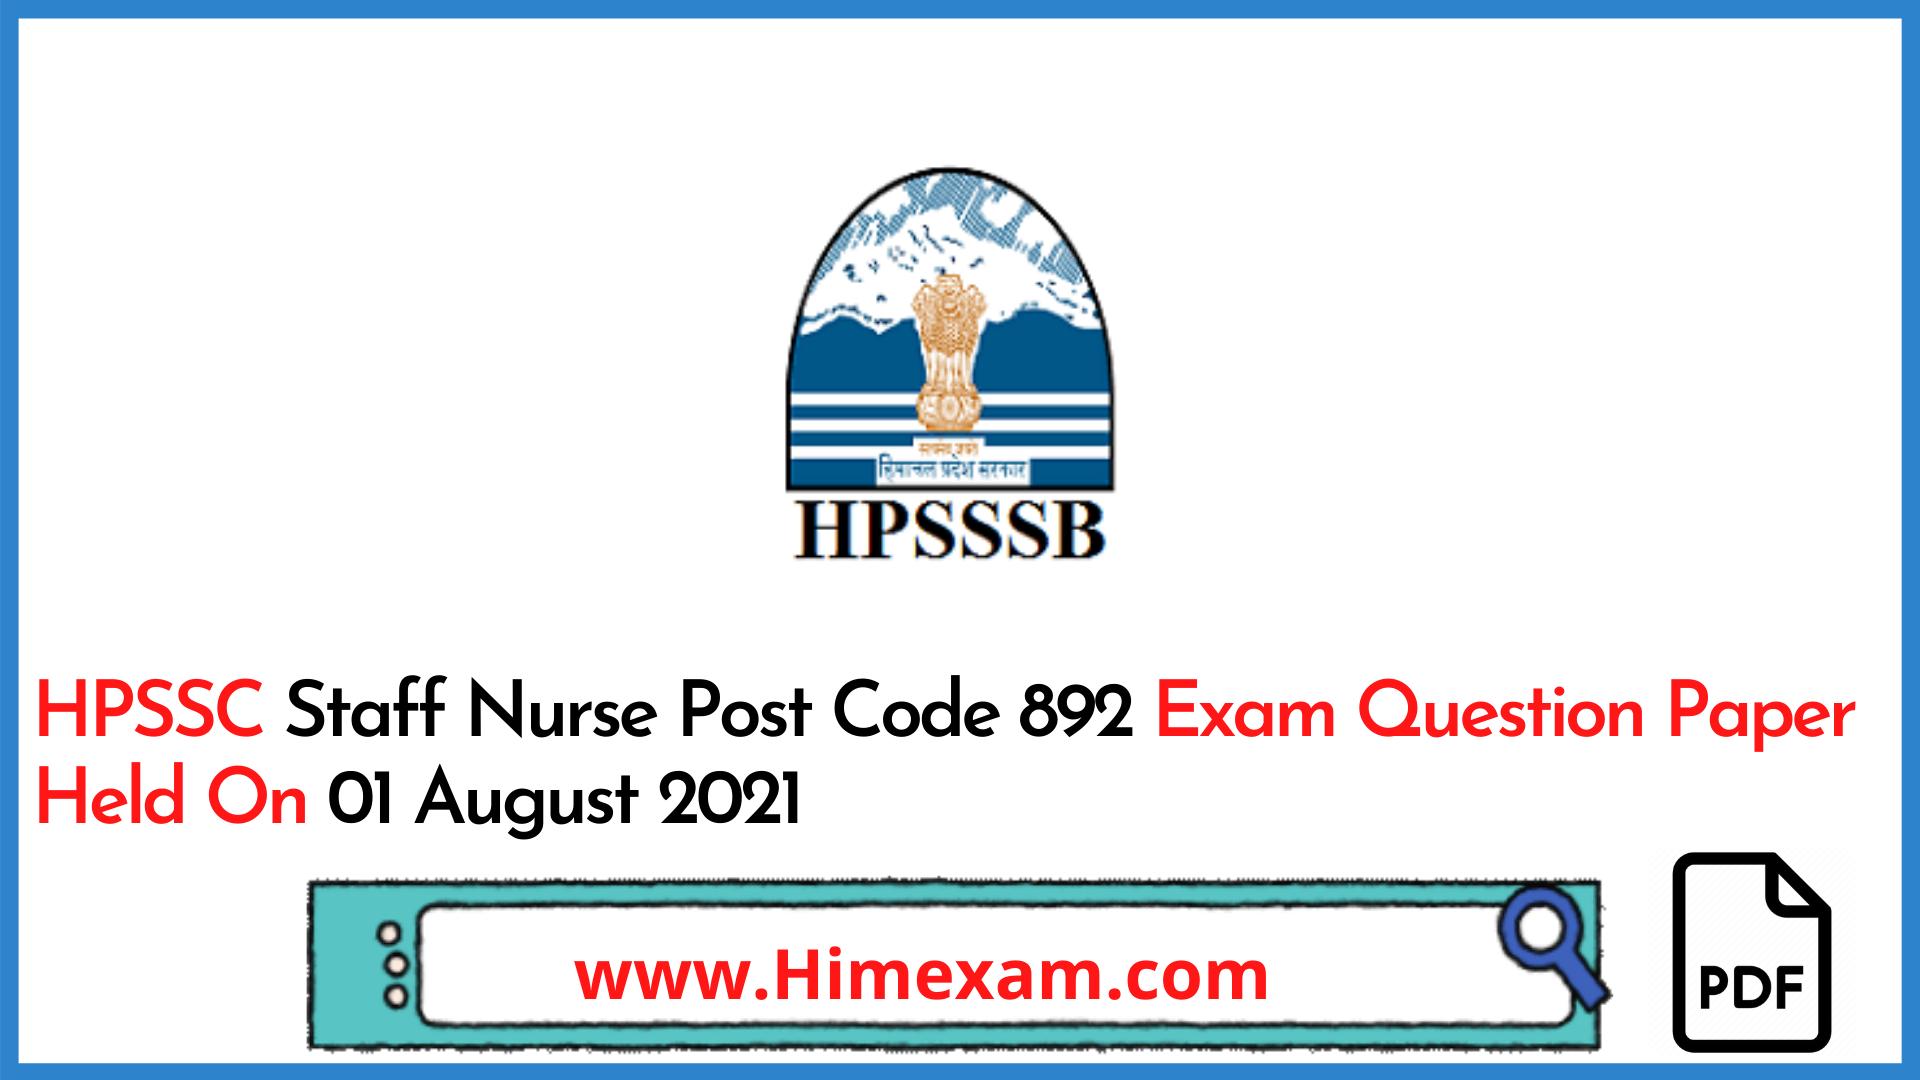 HPSSC Staff Nurse Post Code 892 Exam Question Paper Held On 01 August 2021